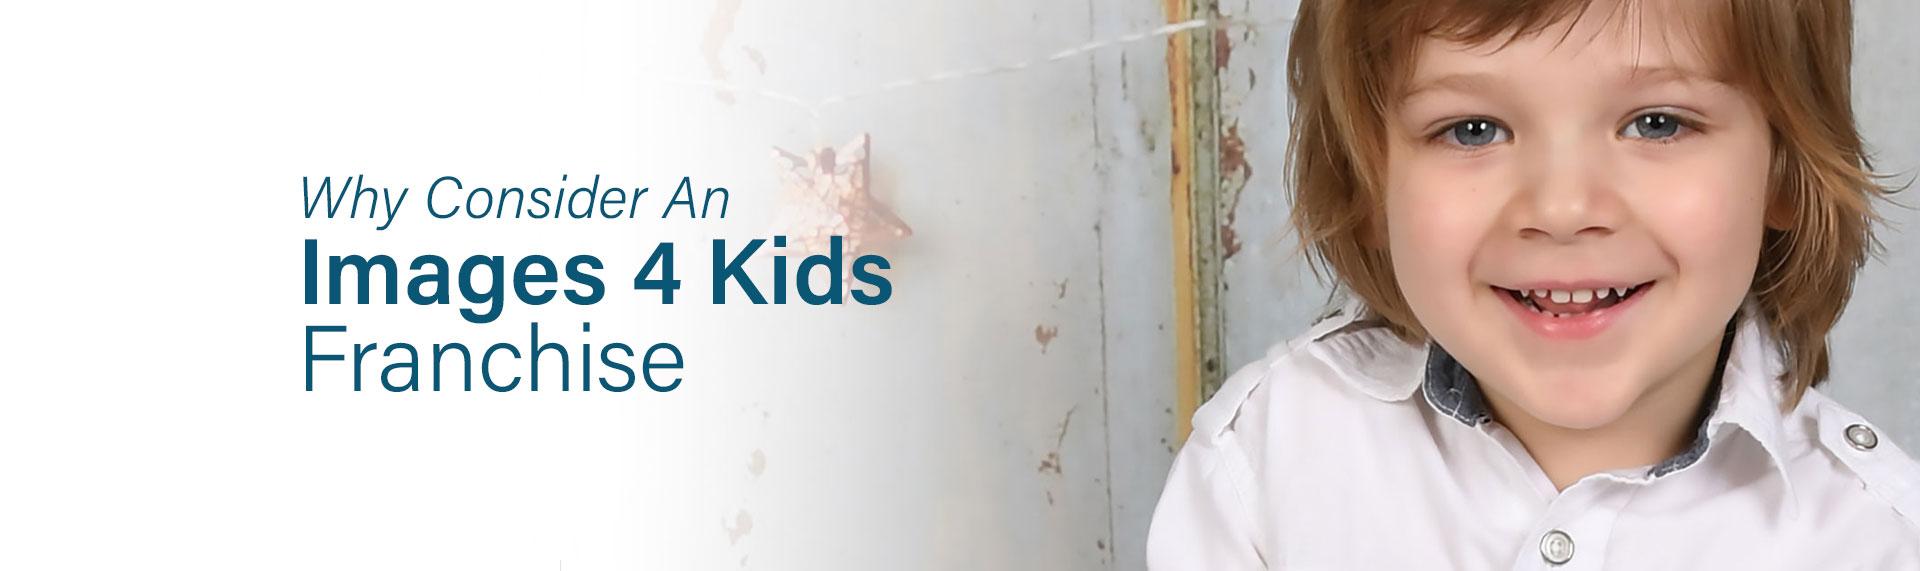 Images 4 Kids Preschool Photography Franchise - Why Images 4 Kids is the best preschool photography franchise